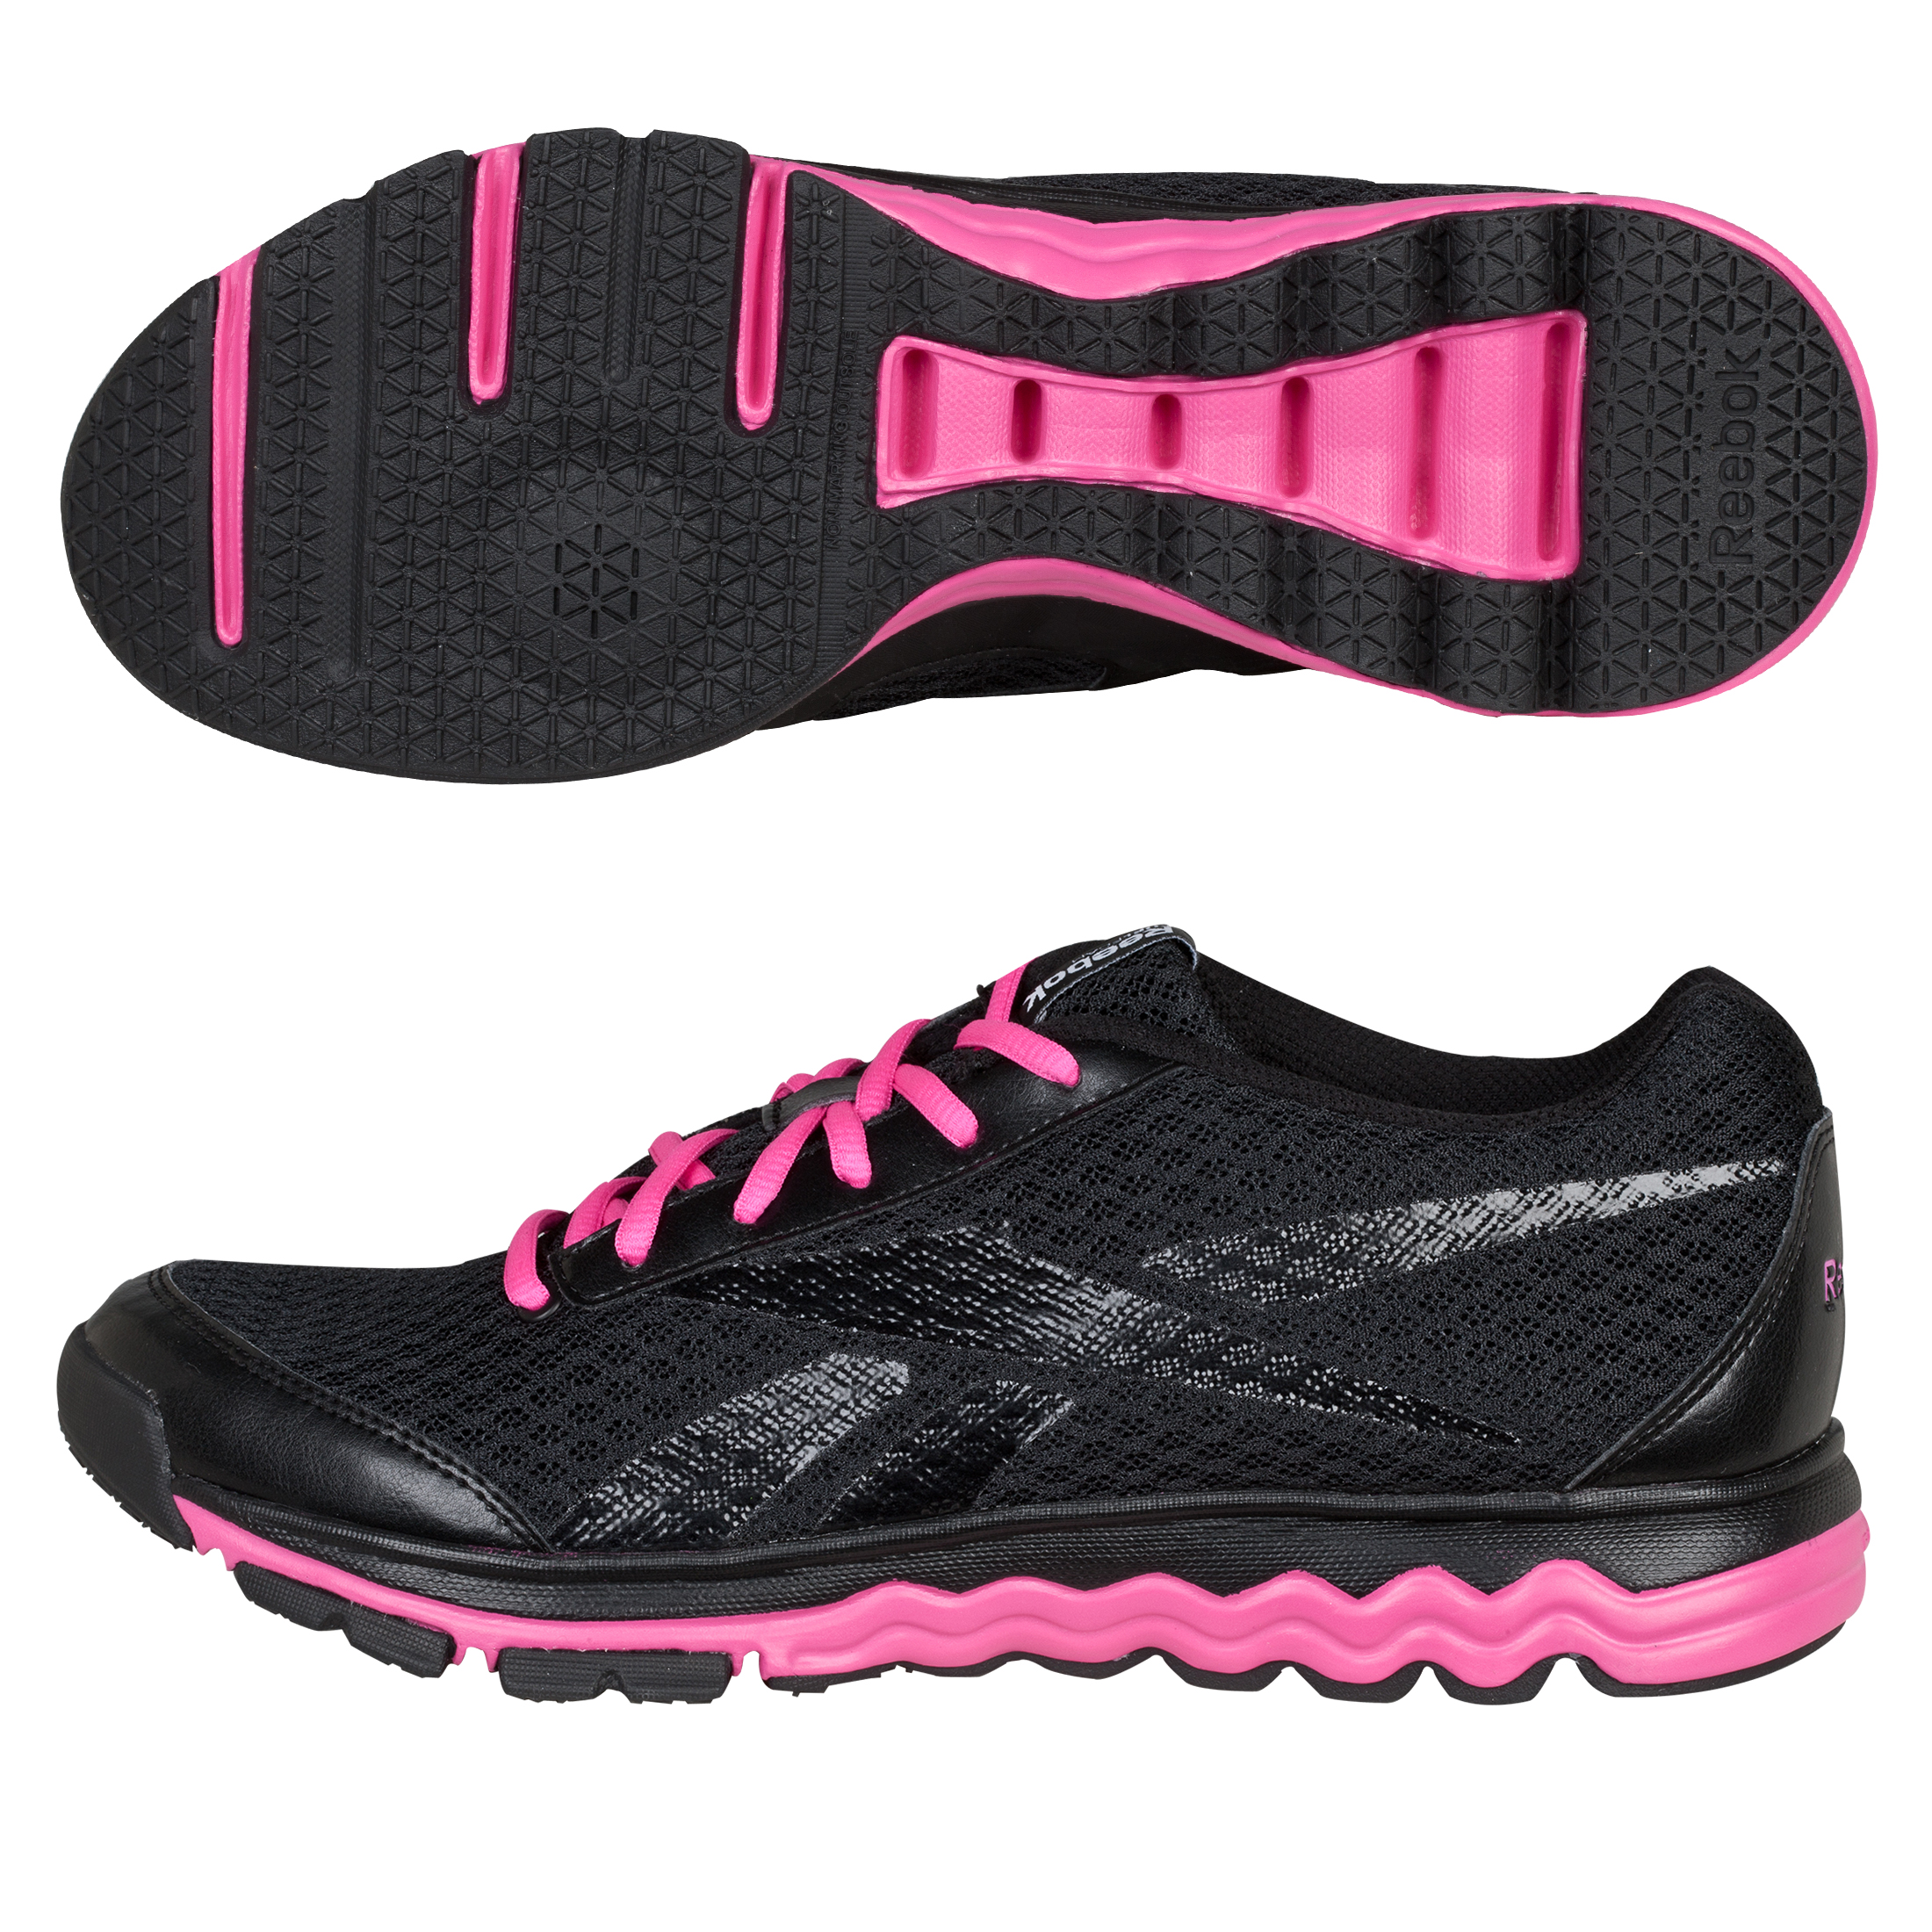 Reebok Fuel Gym Low Trainer - Black/Pink - Women